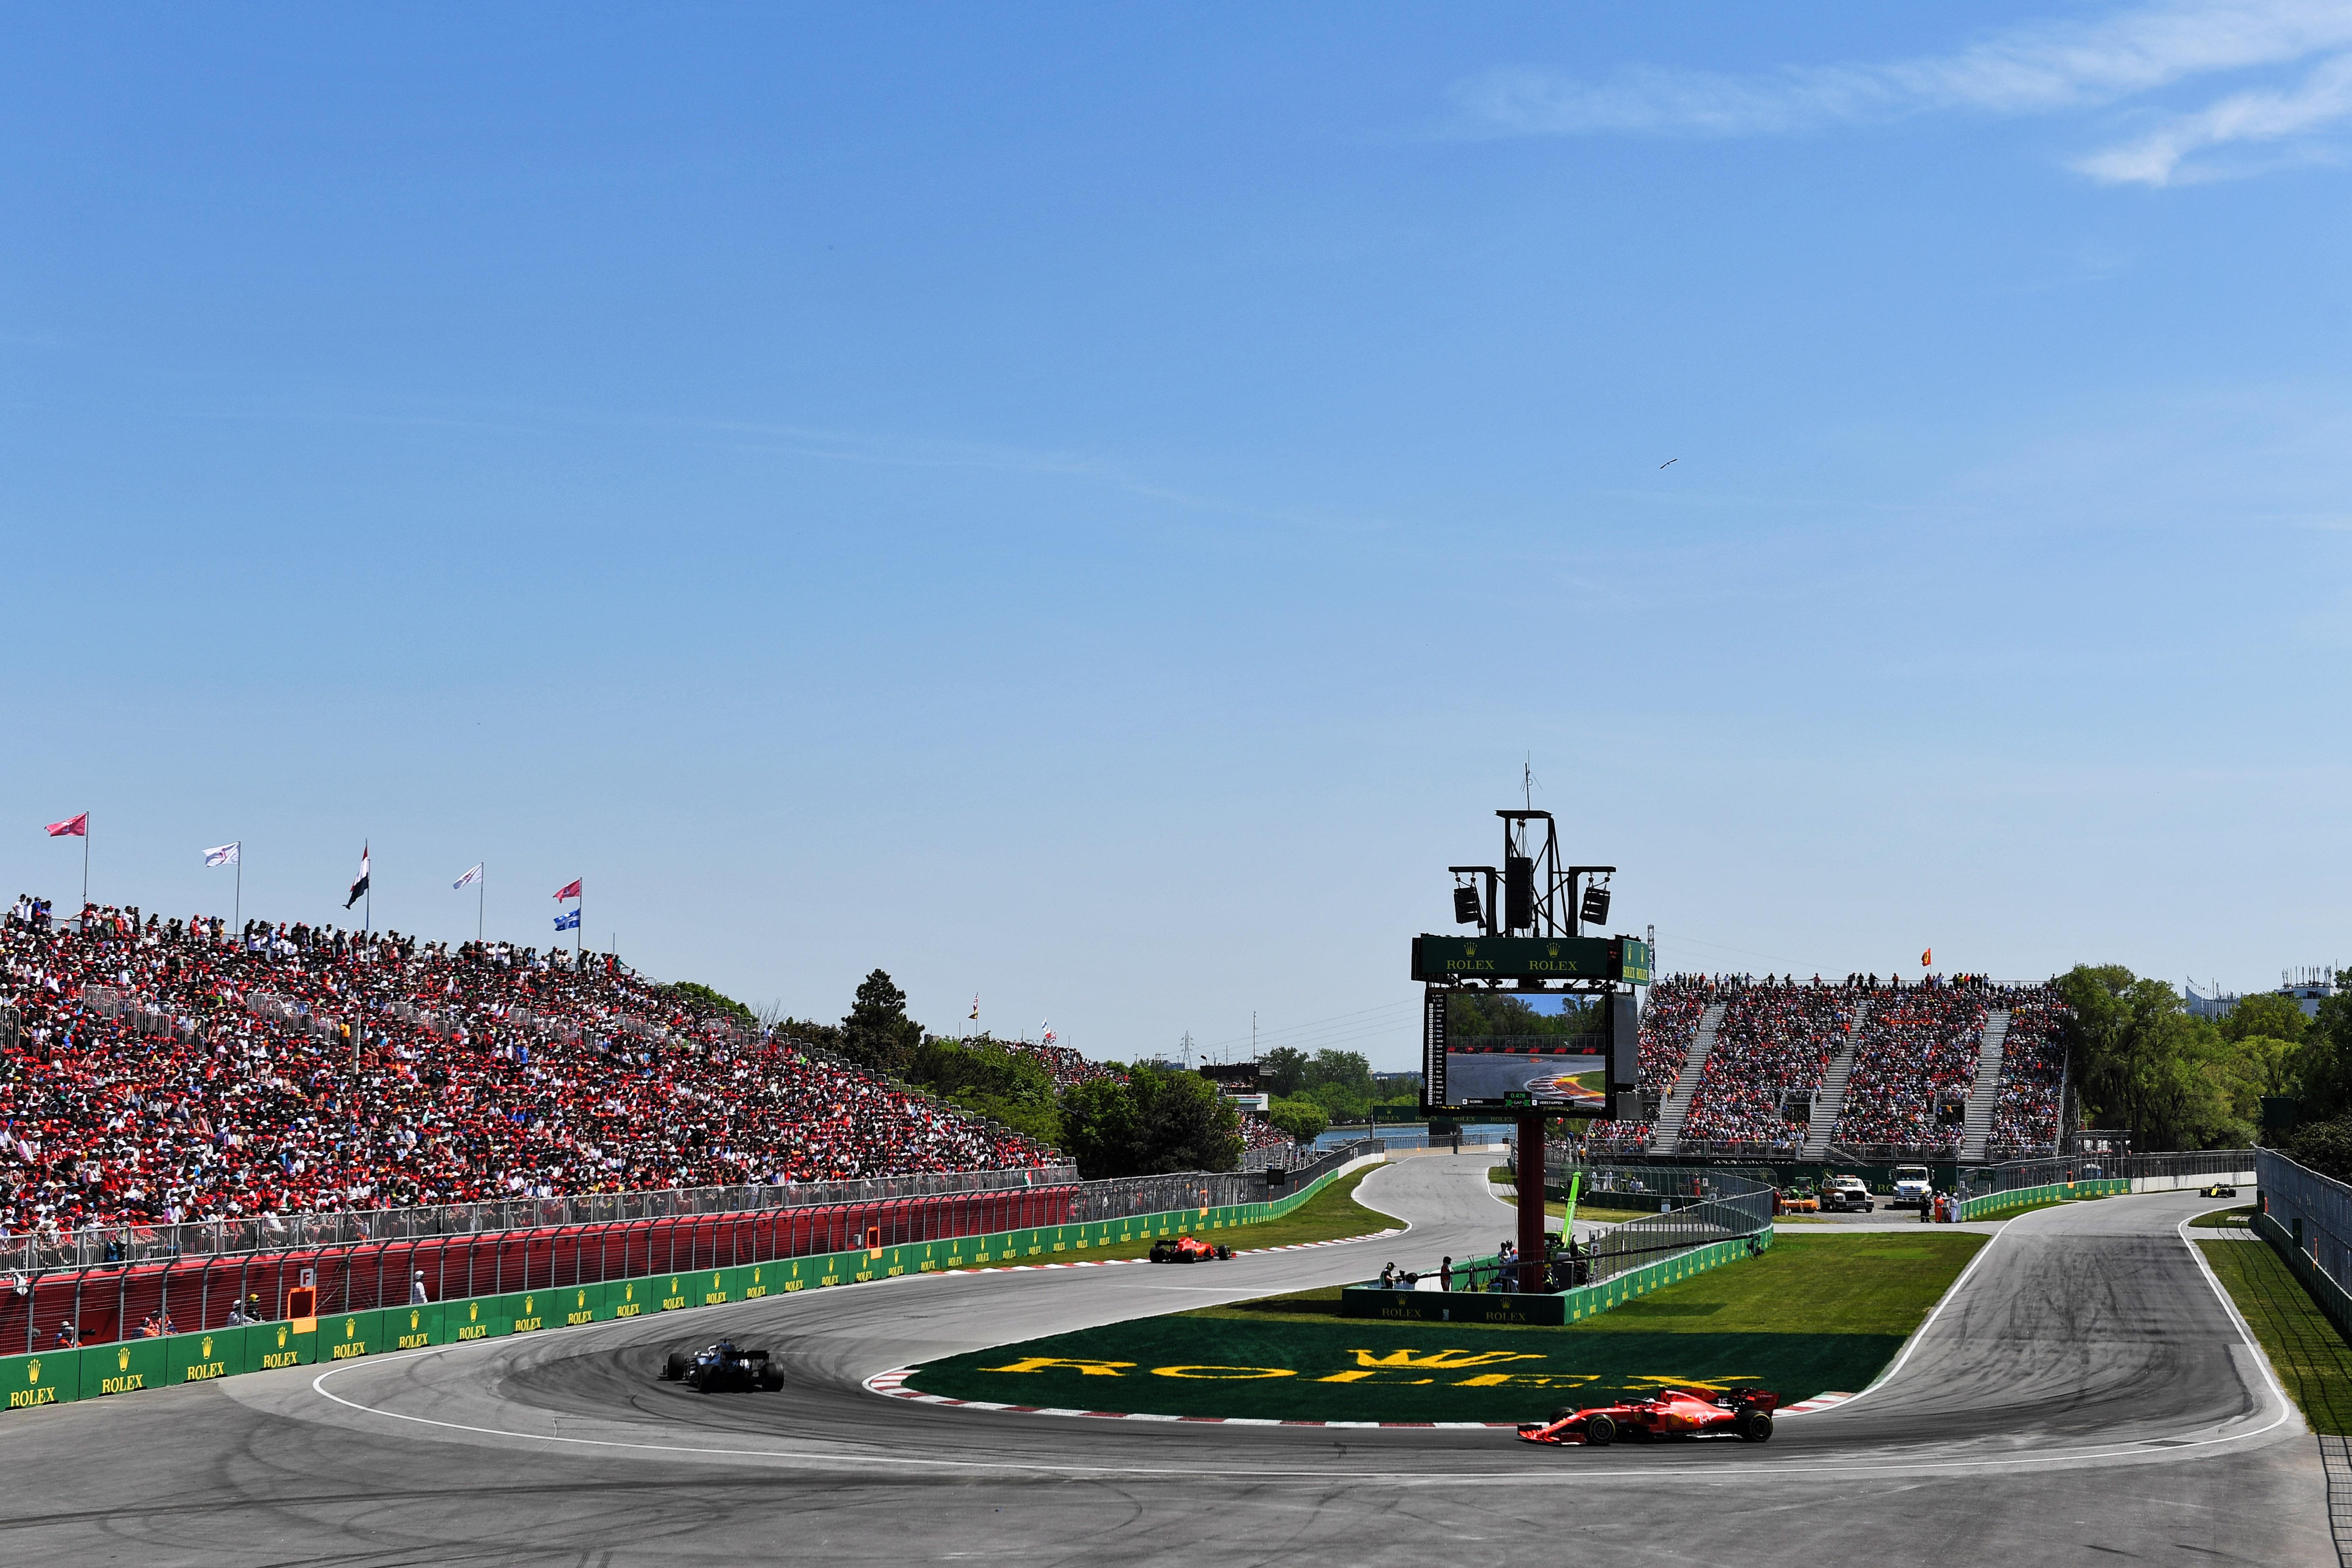 Motor Racing Formula One World Championship Canadian Grand Prix Race Day Montreal, Canada